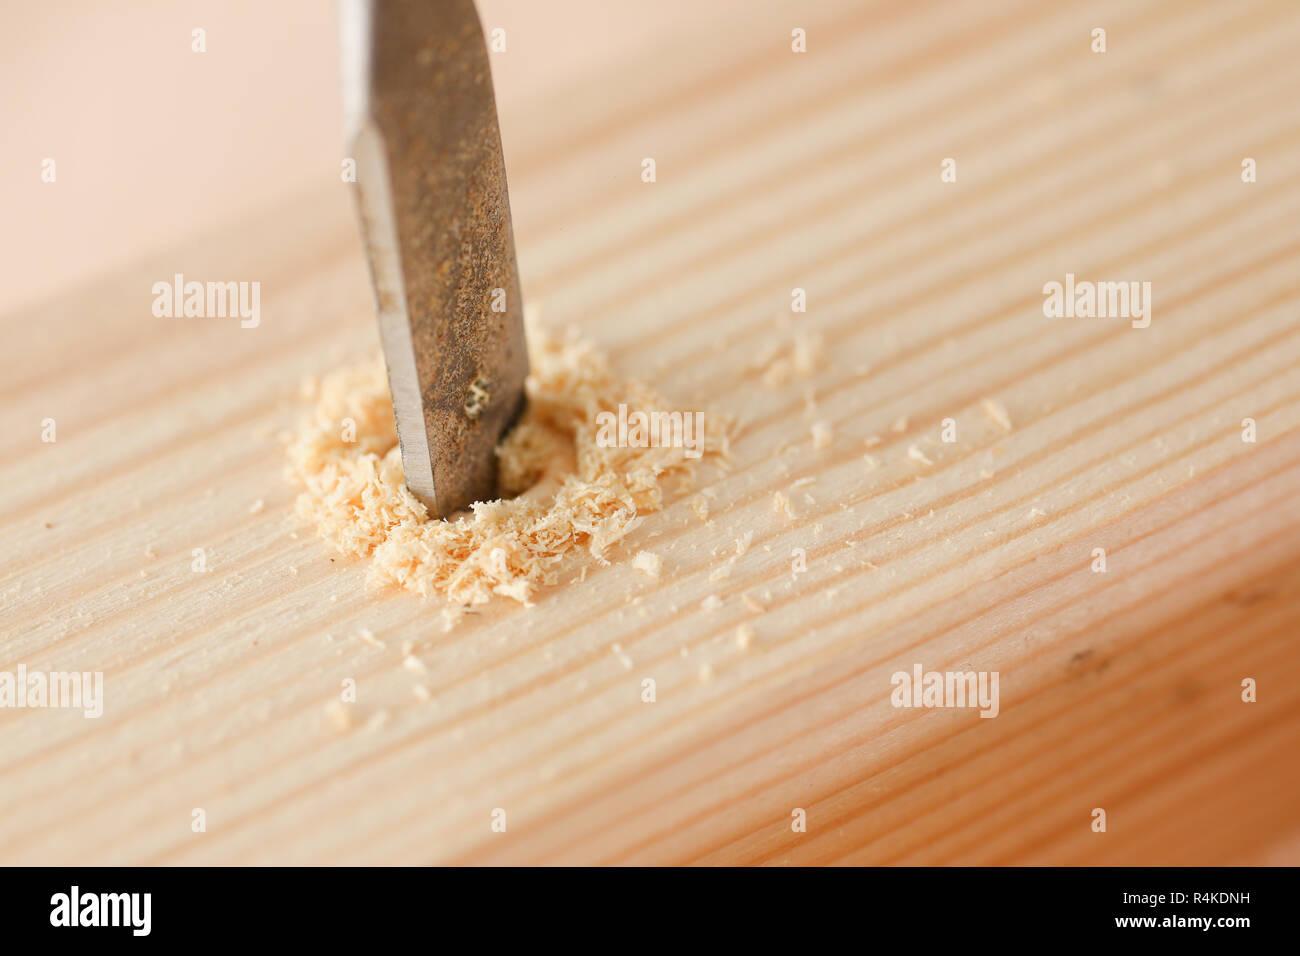 Flat drill bit make hole in wooden bar closeup - Stock Image